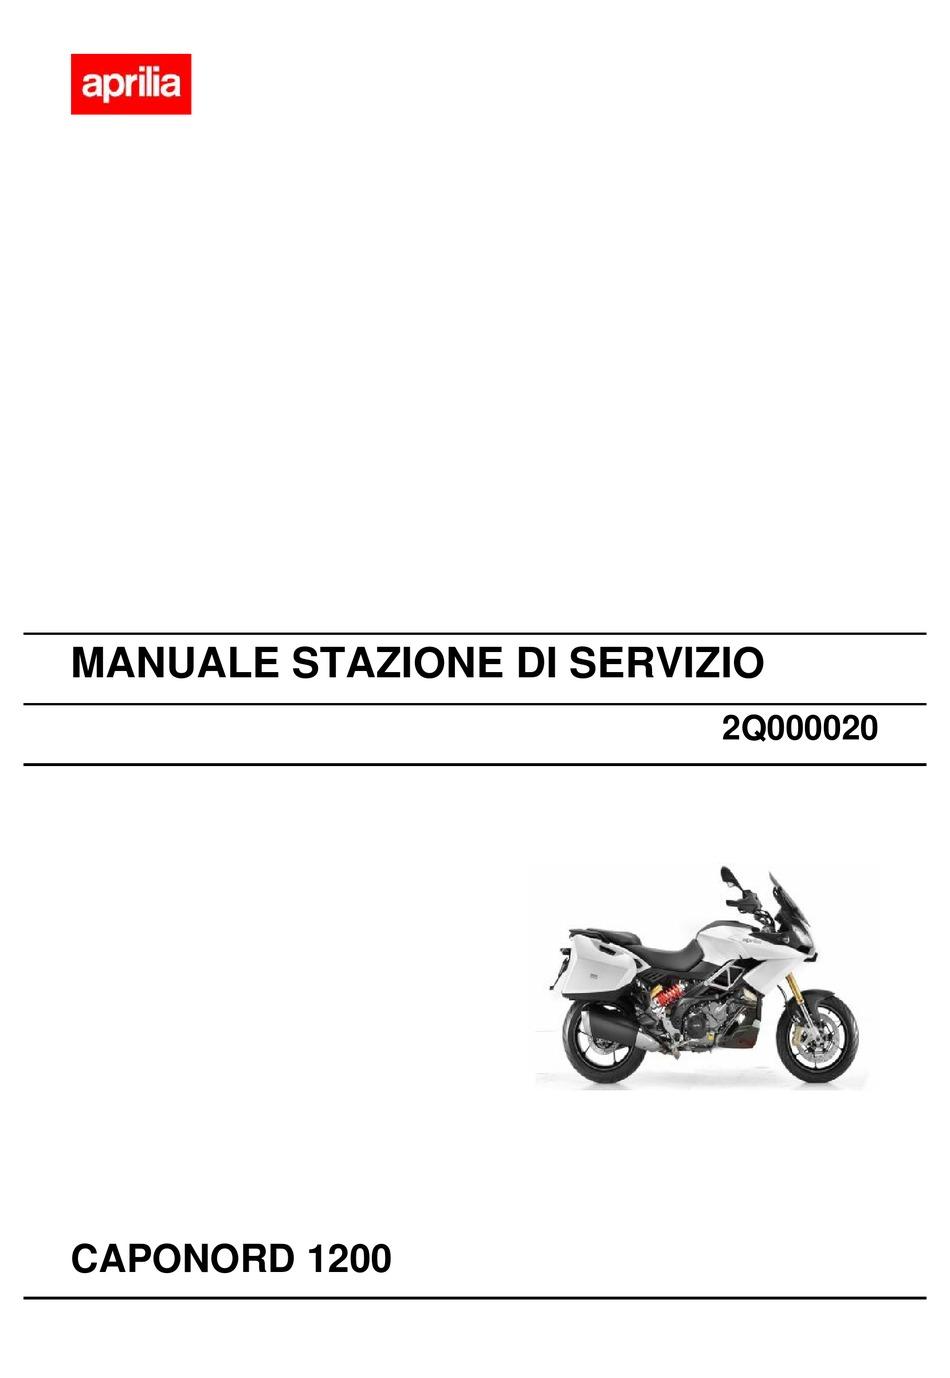 Aprilia Caponord 1200 Service Station Manual Pdf Download Manualslib